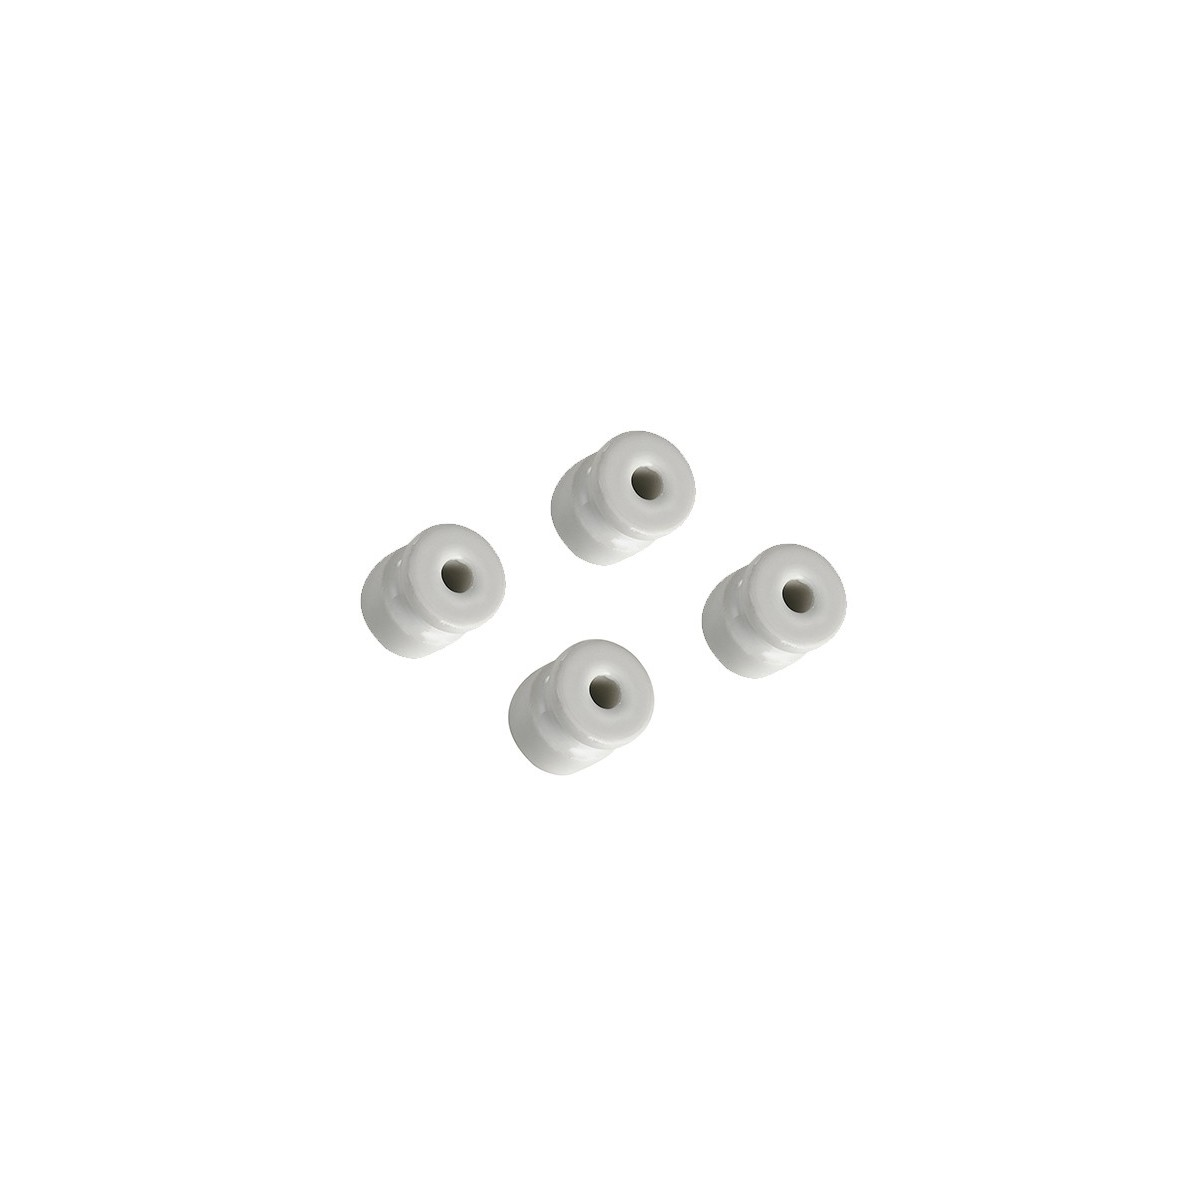 I-CLAY-ISOLATORI - Kit 4 Isolatori Porcellana Bianca